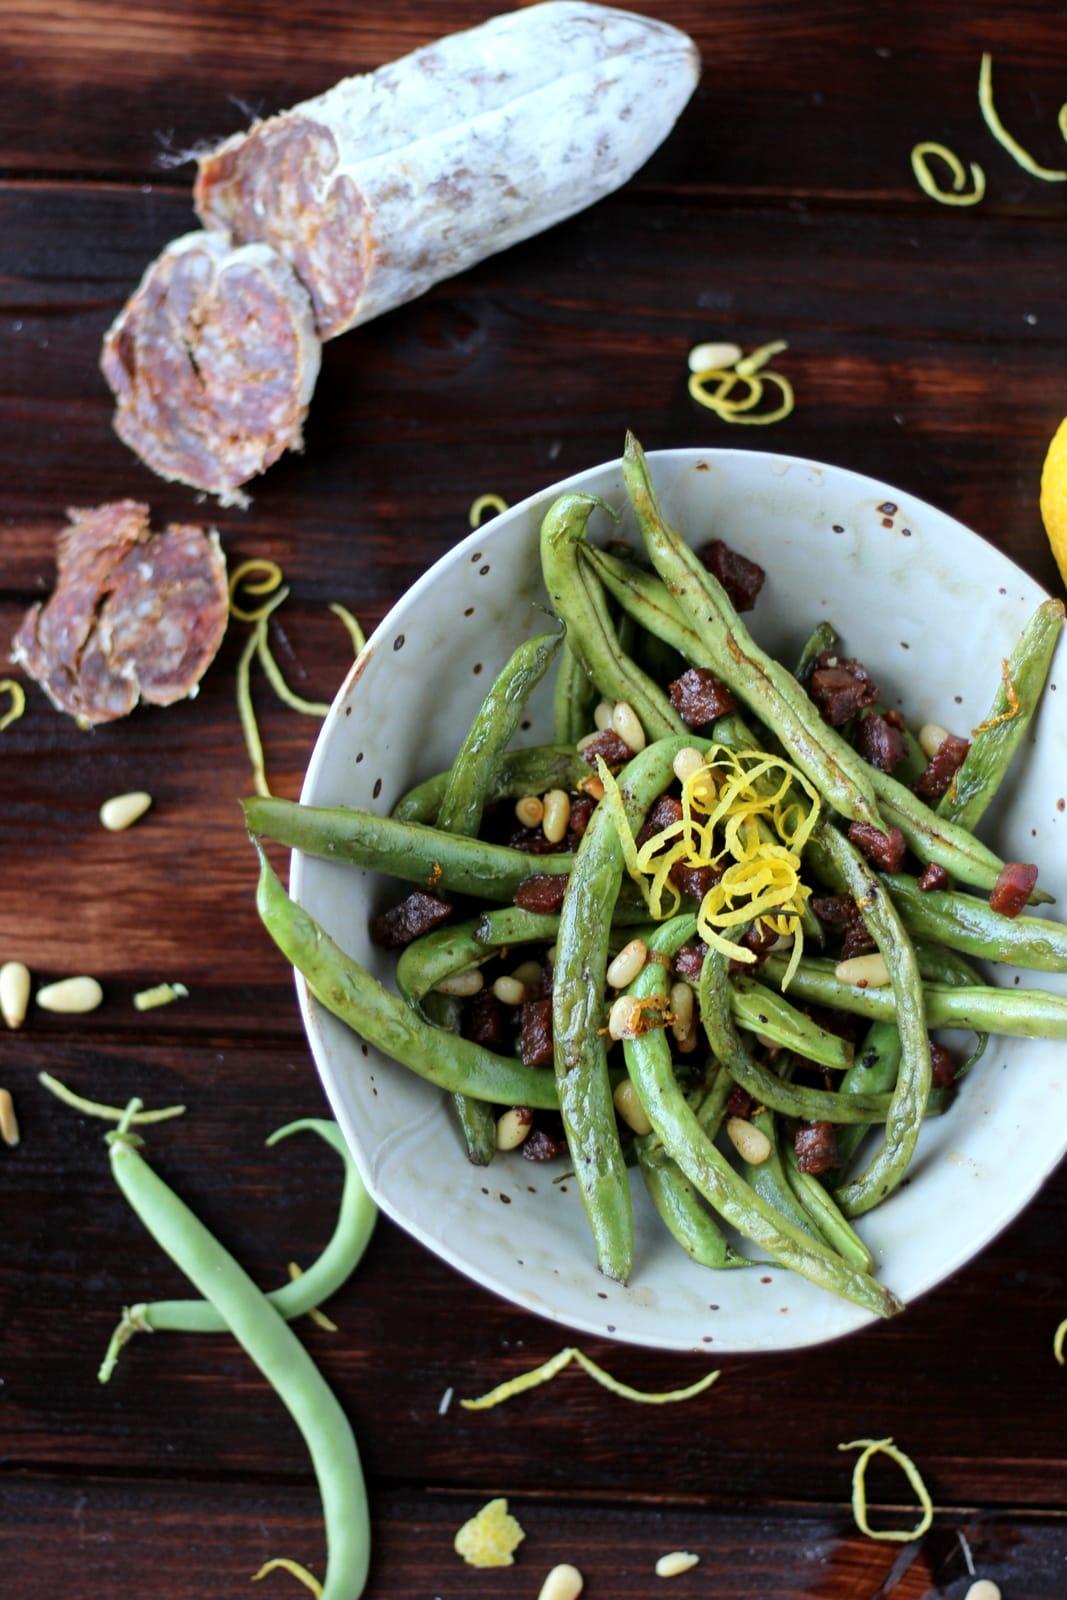 Blackened Green Beans with Chorizo, Pine Nuts and Fresh Lemon Zest - thewoodenskillet.com #sidedish #healthy